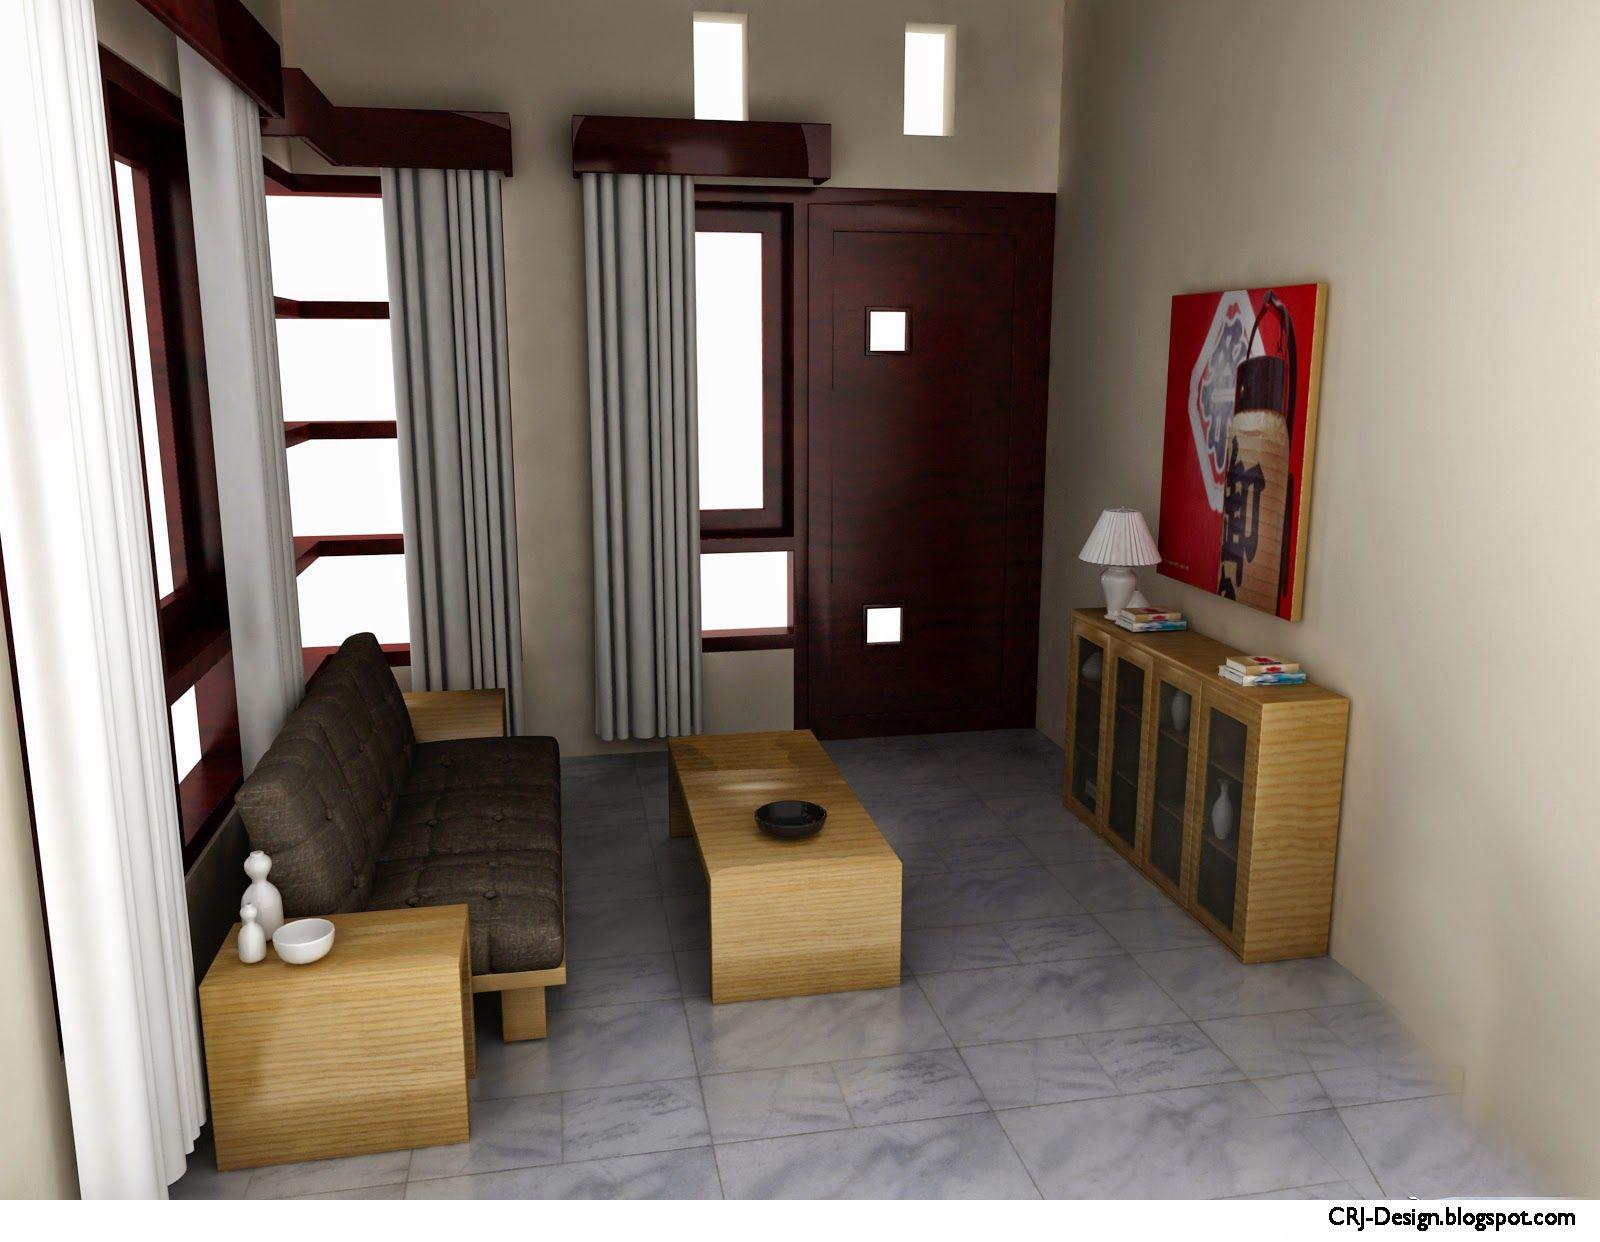 Tempat Utama Pada Yang Disambangi Oleh Pengunjung Rumah Minimalis